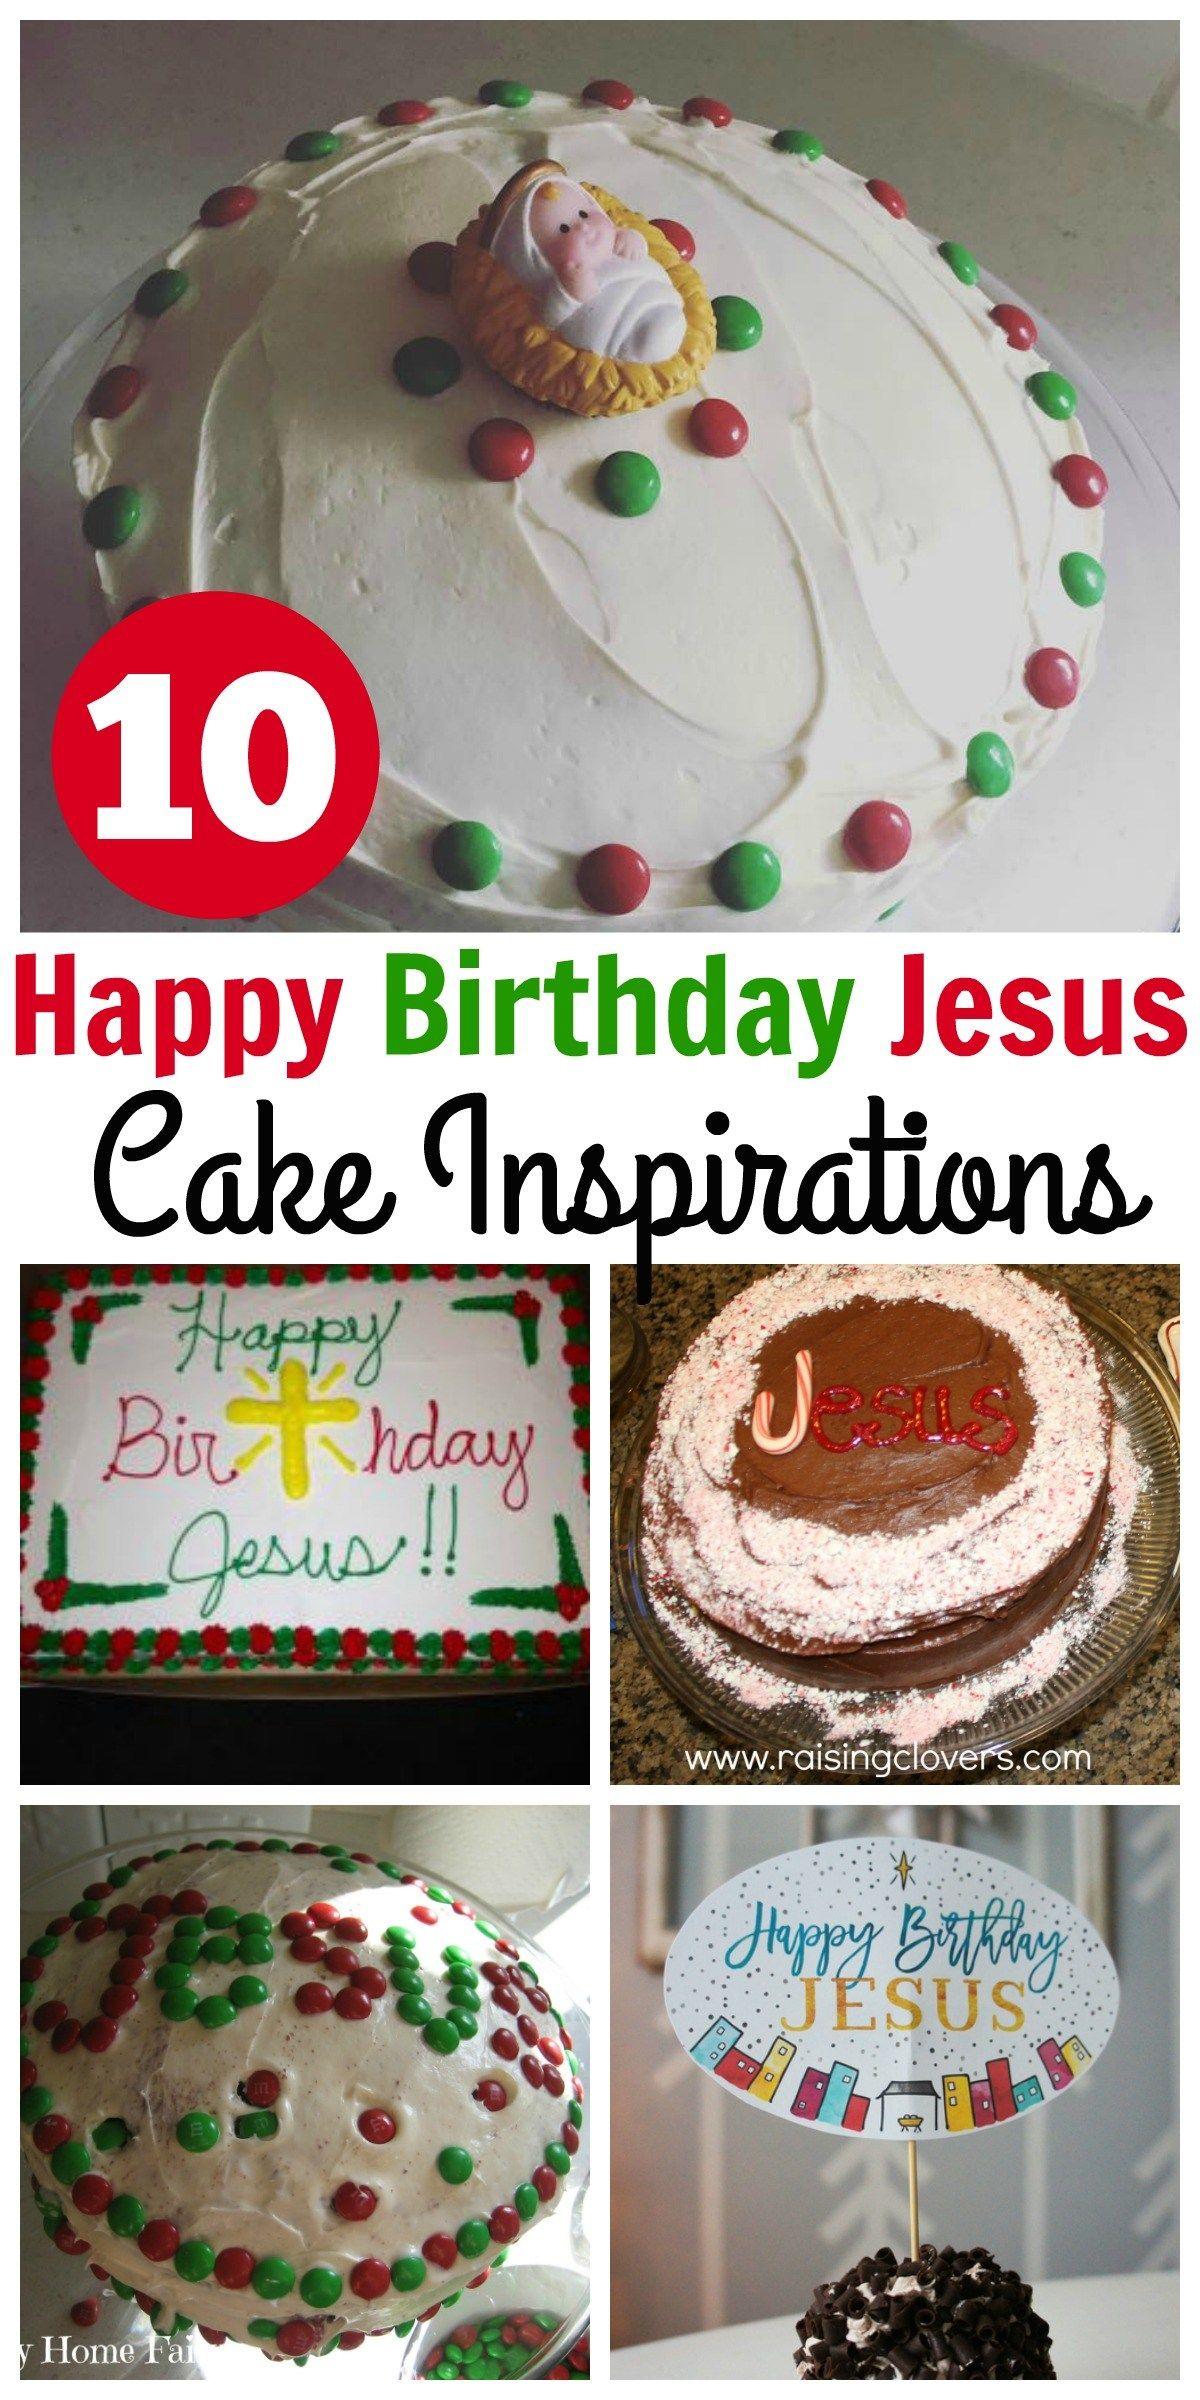 Happy Birthday Jesus Cake Ideas Happy birthday jesus